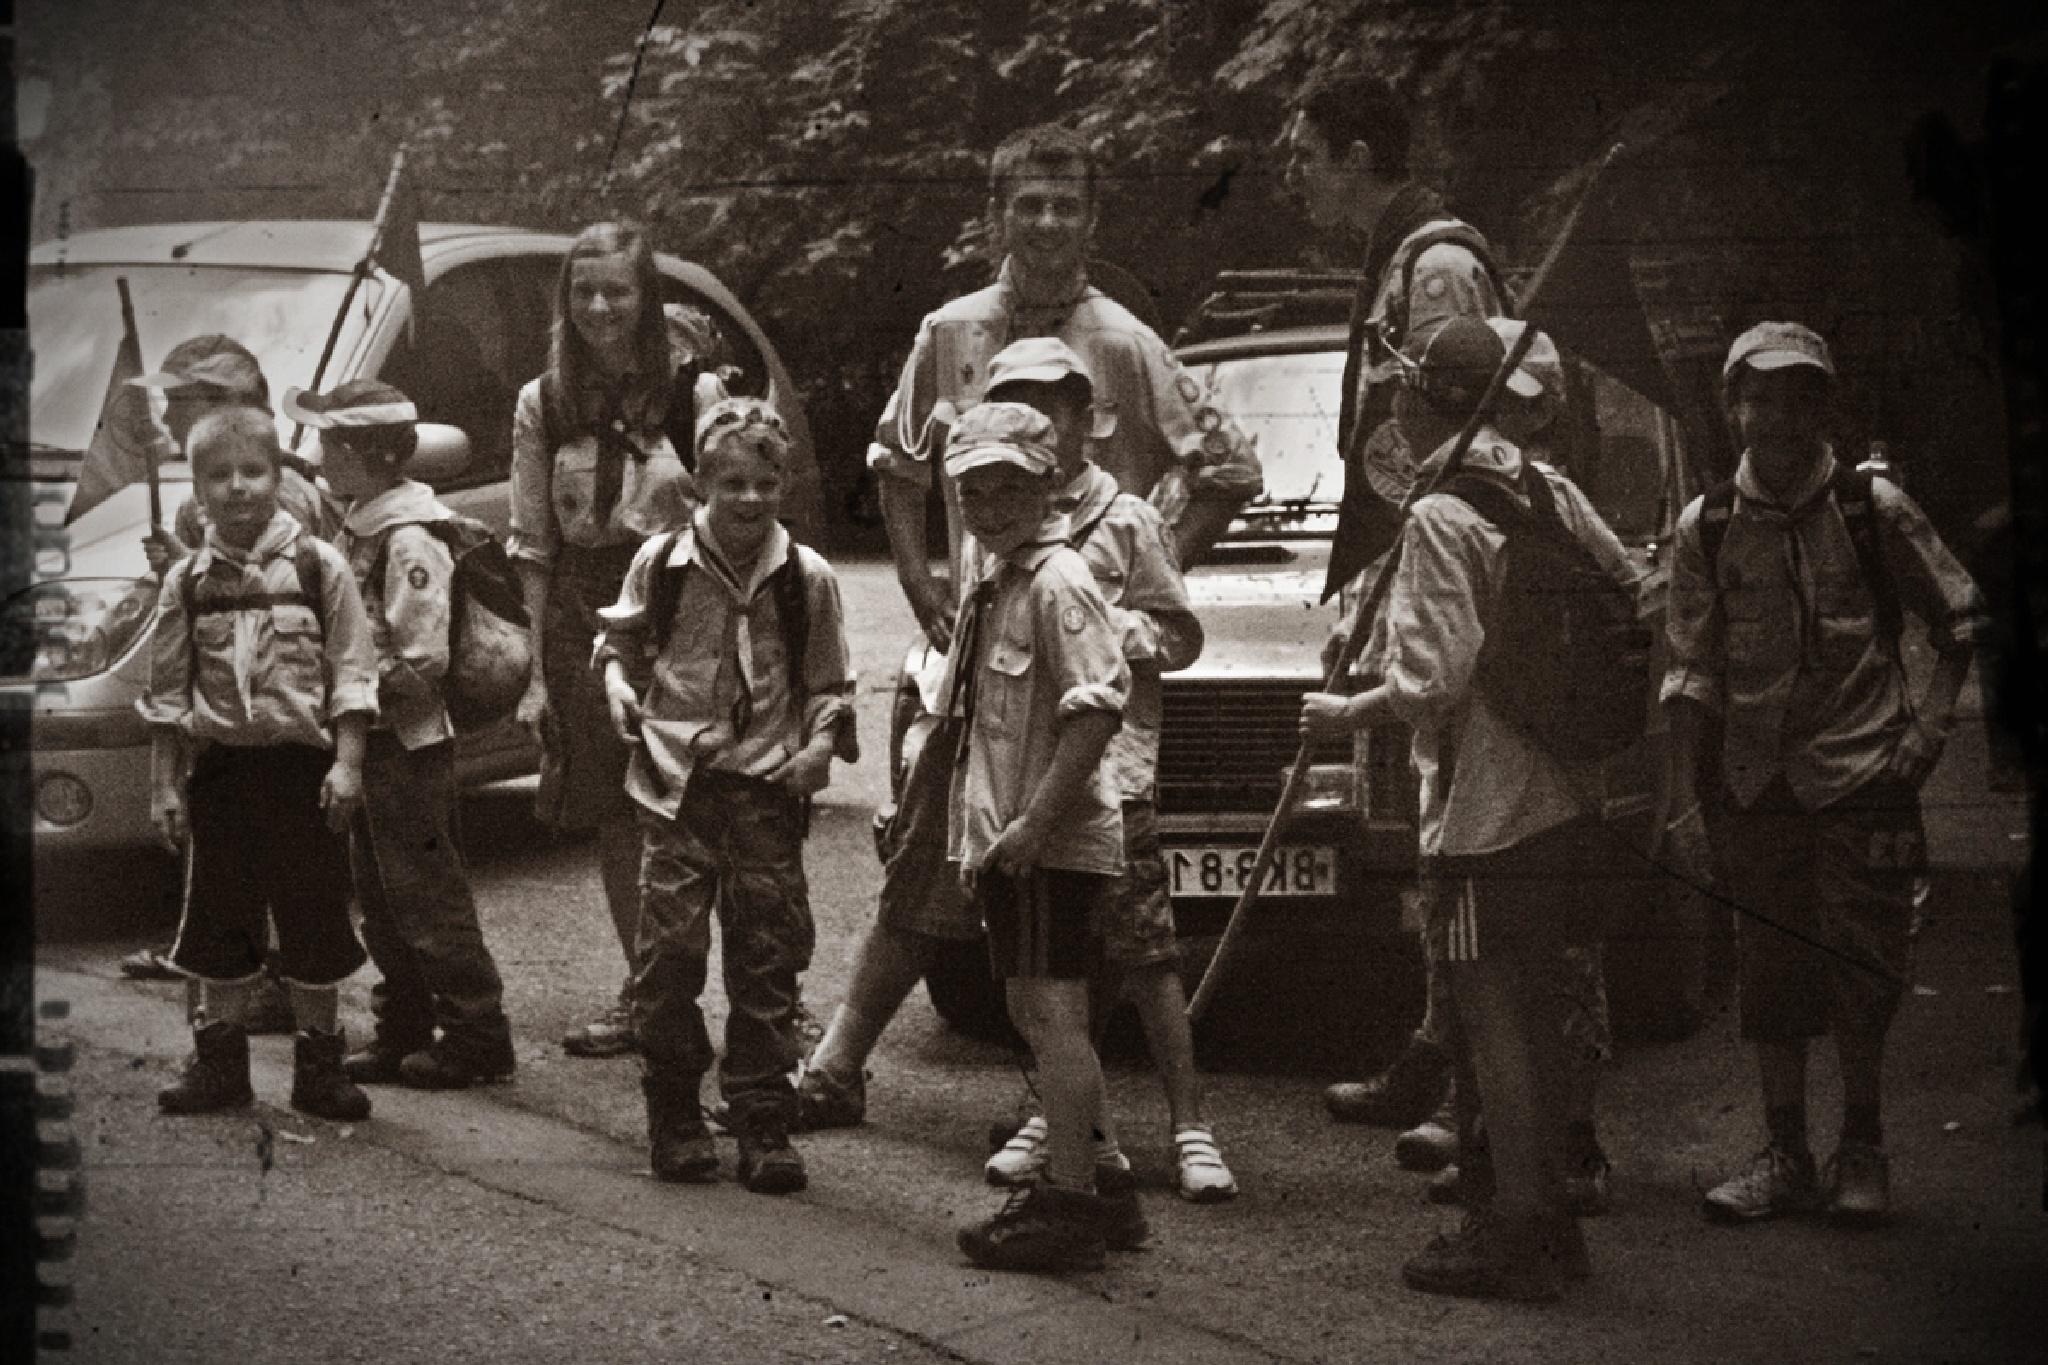 Detachment of scouts by Bobbyus